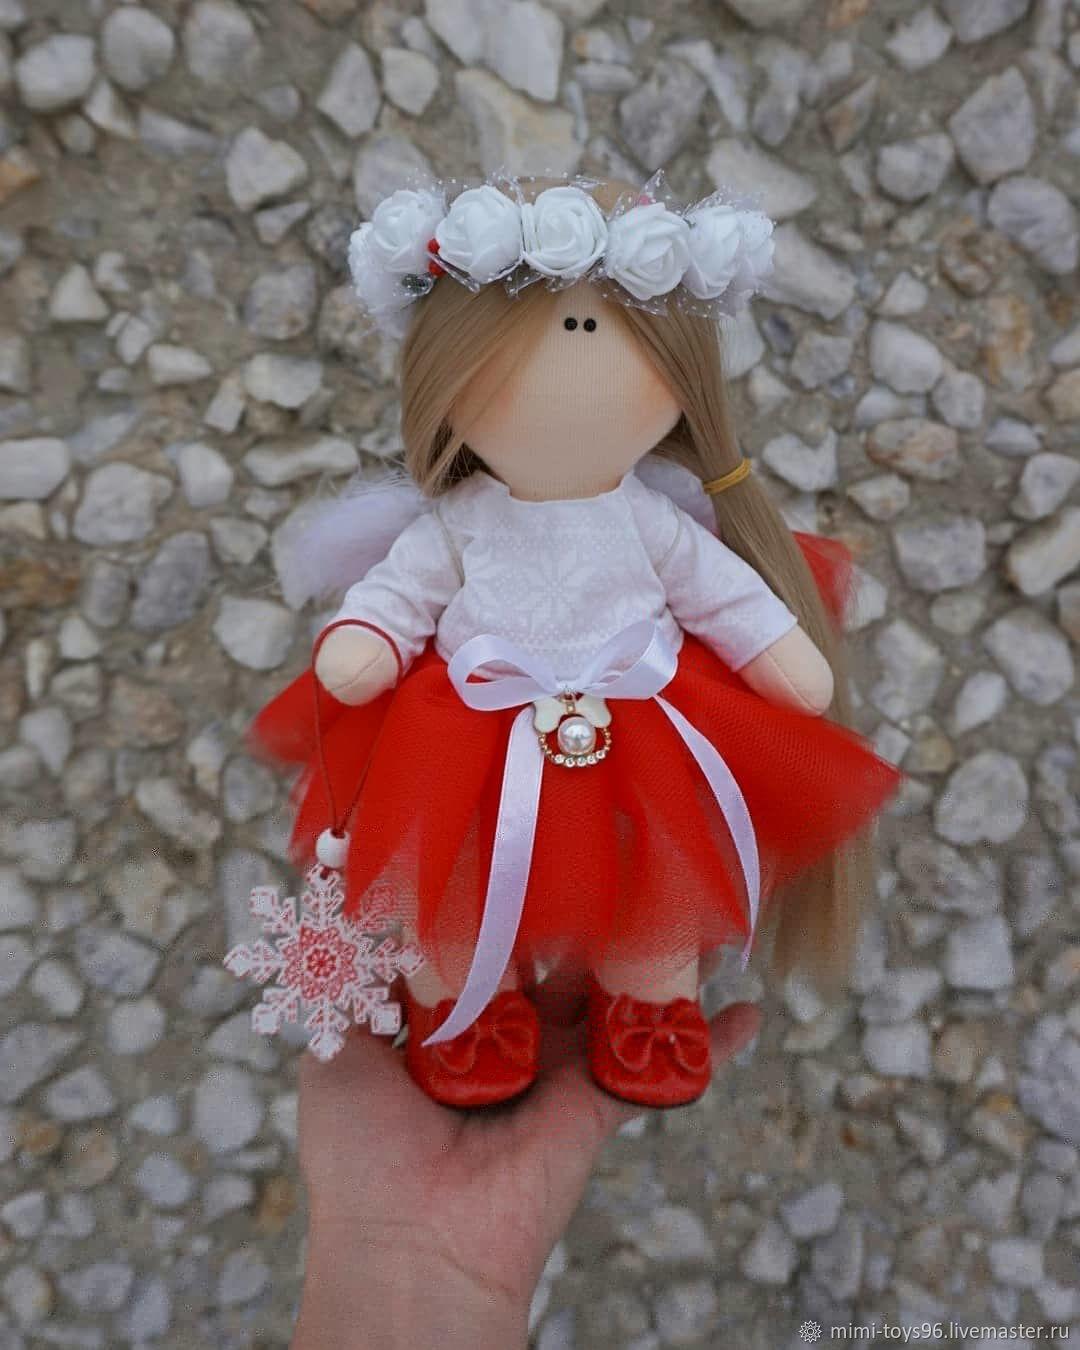 Кукла Ангел, Куклы и пупсы, Верхняя Пышма,  Фото №1